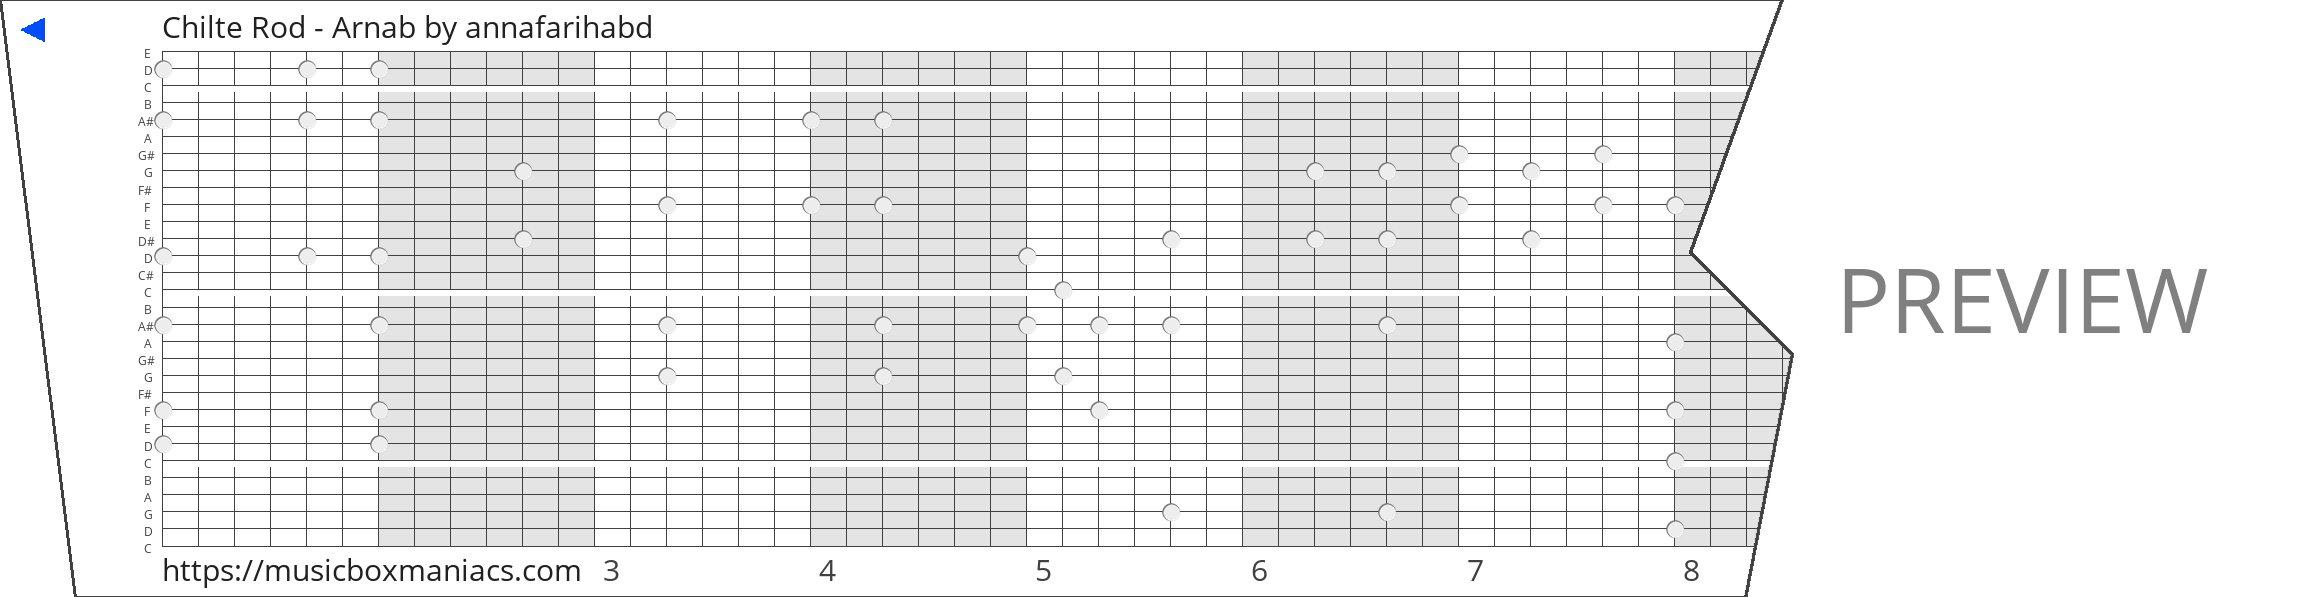 Chilte Rod - Arnab 30 note music box paper strip